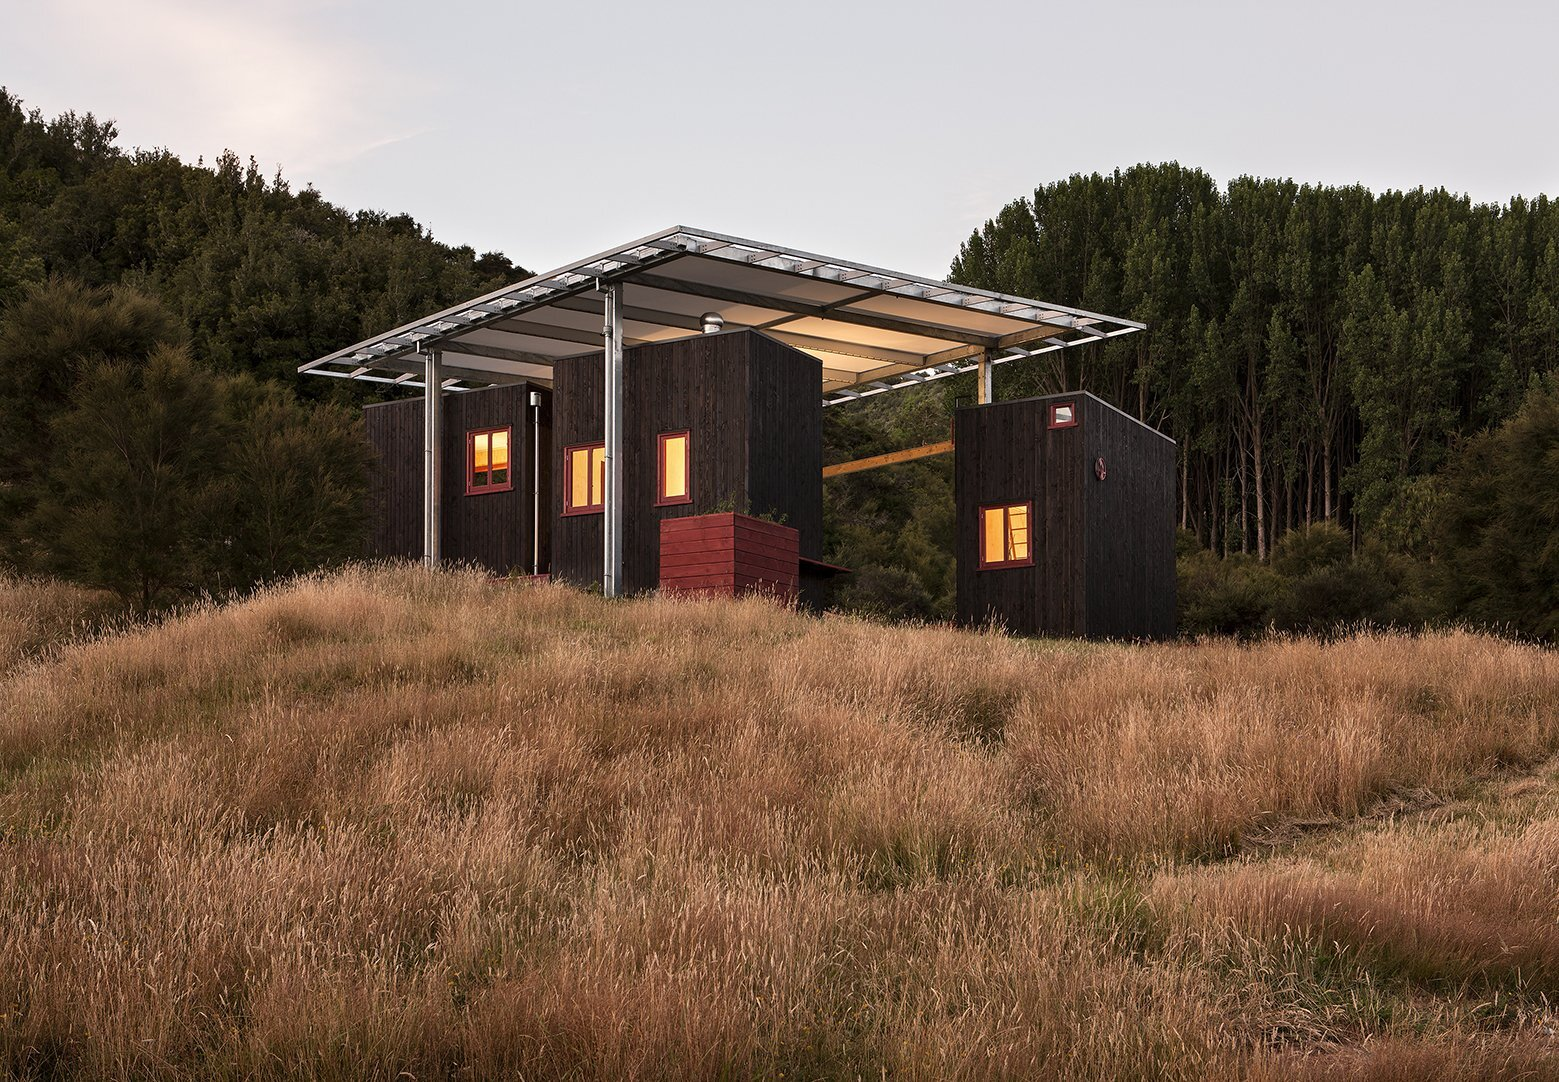 Longbush Ecosanctuary Welcome Shelter - Sarosh Mulla Design - New Zealand - Exterior - Humble Homes